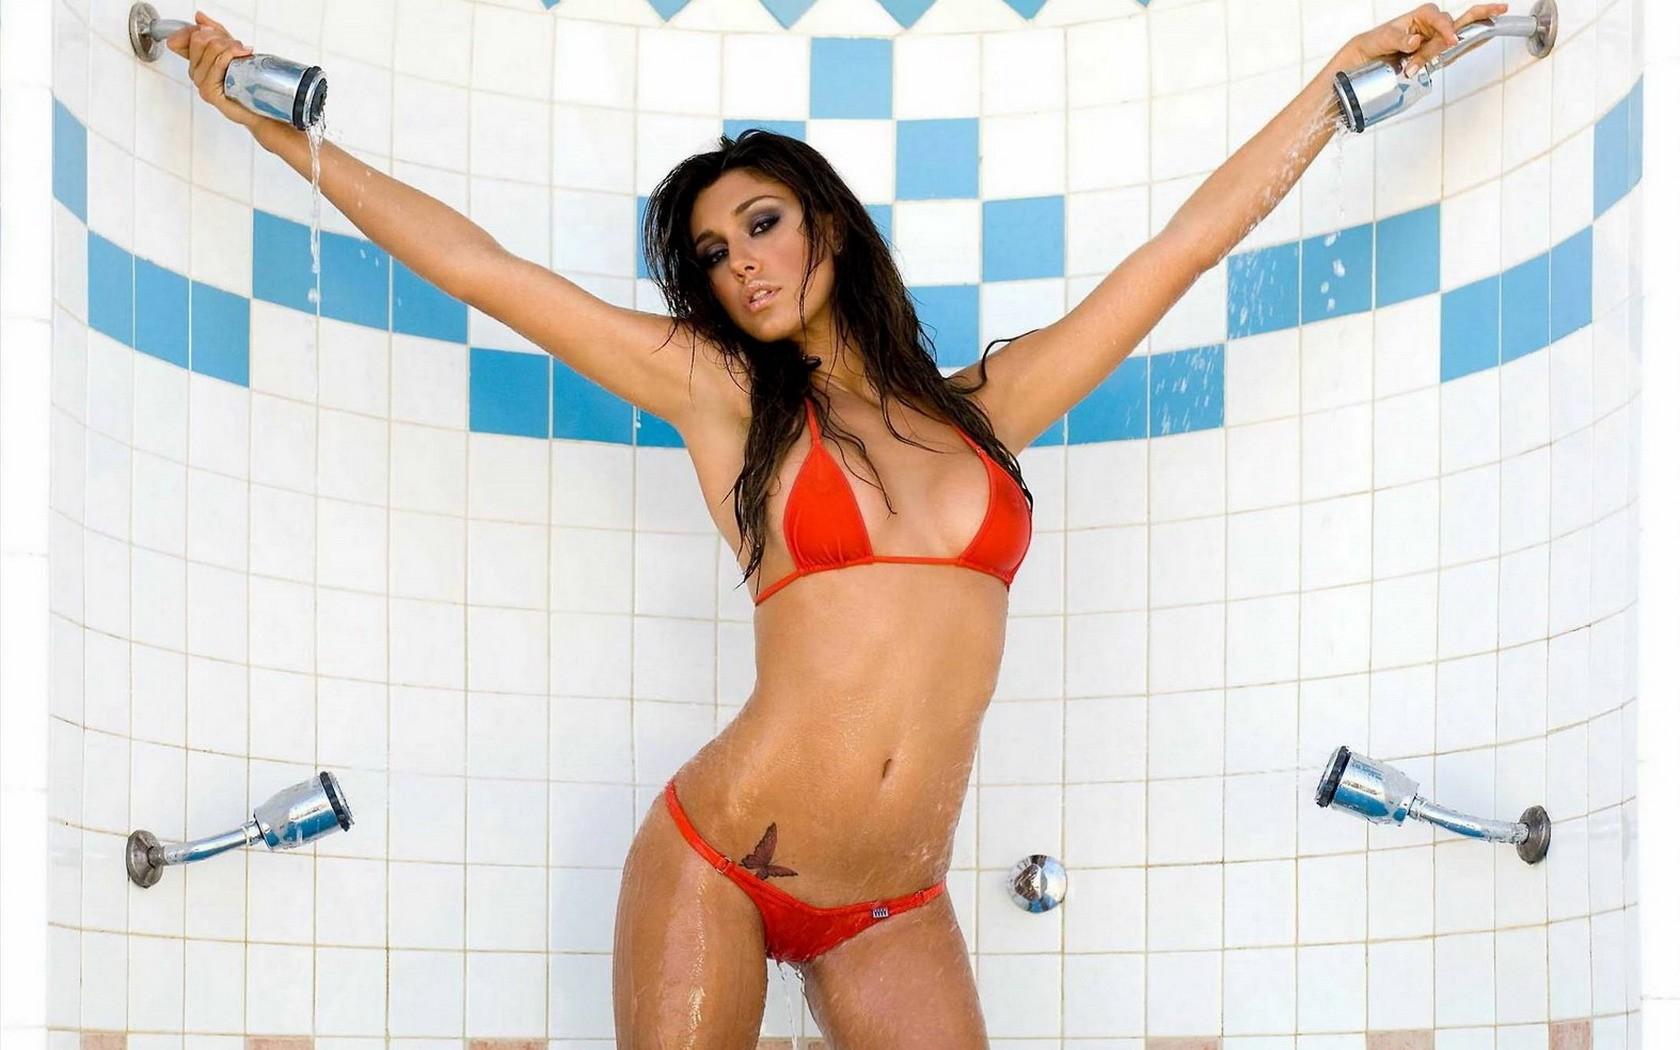 People 1680x1050 alt girls boobs shower wet body